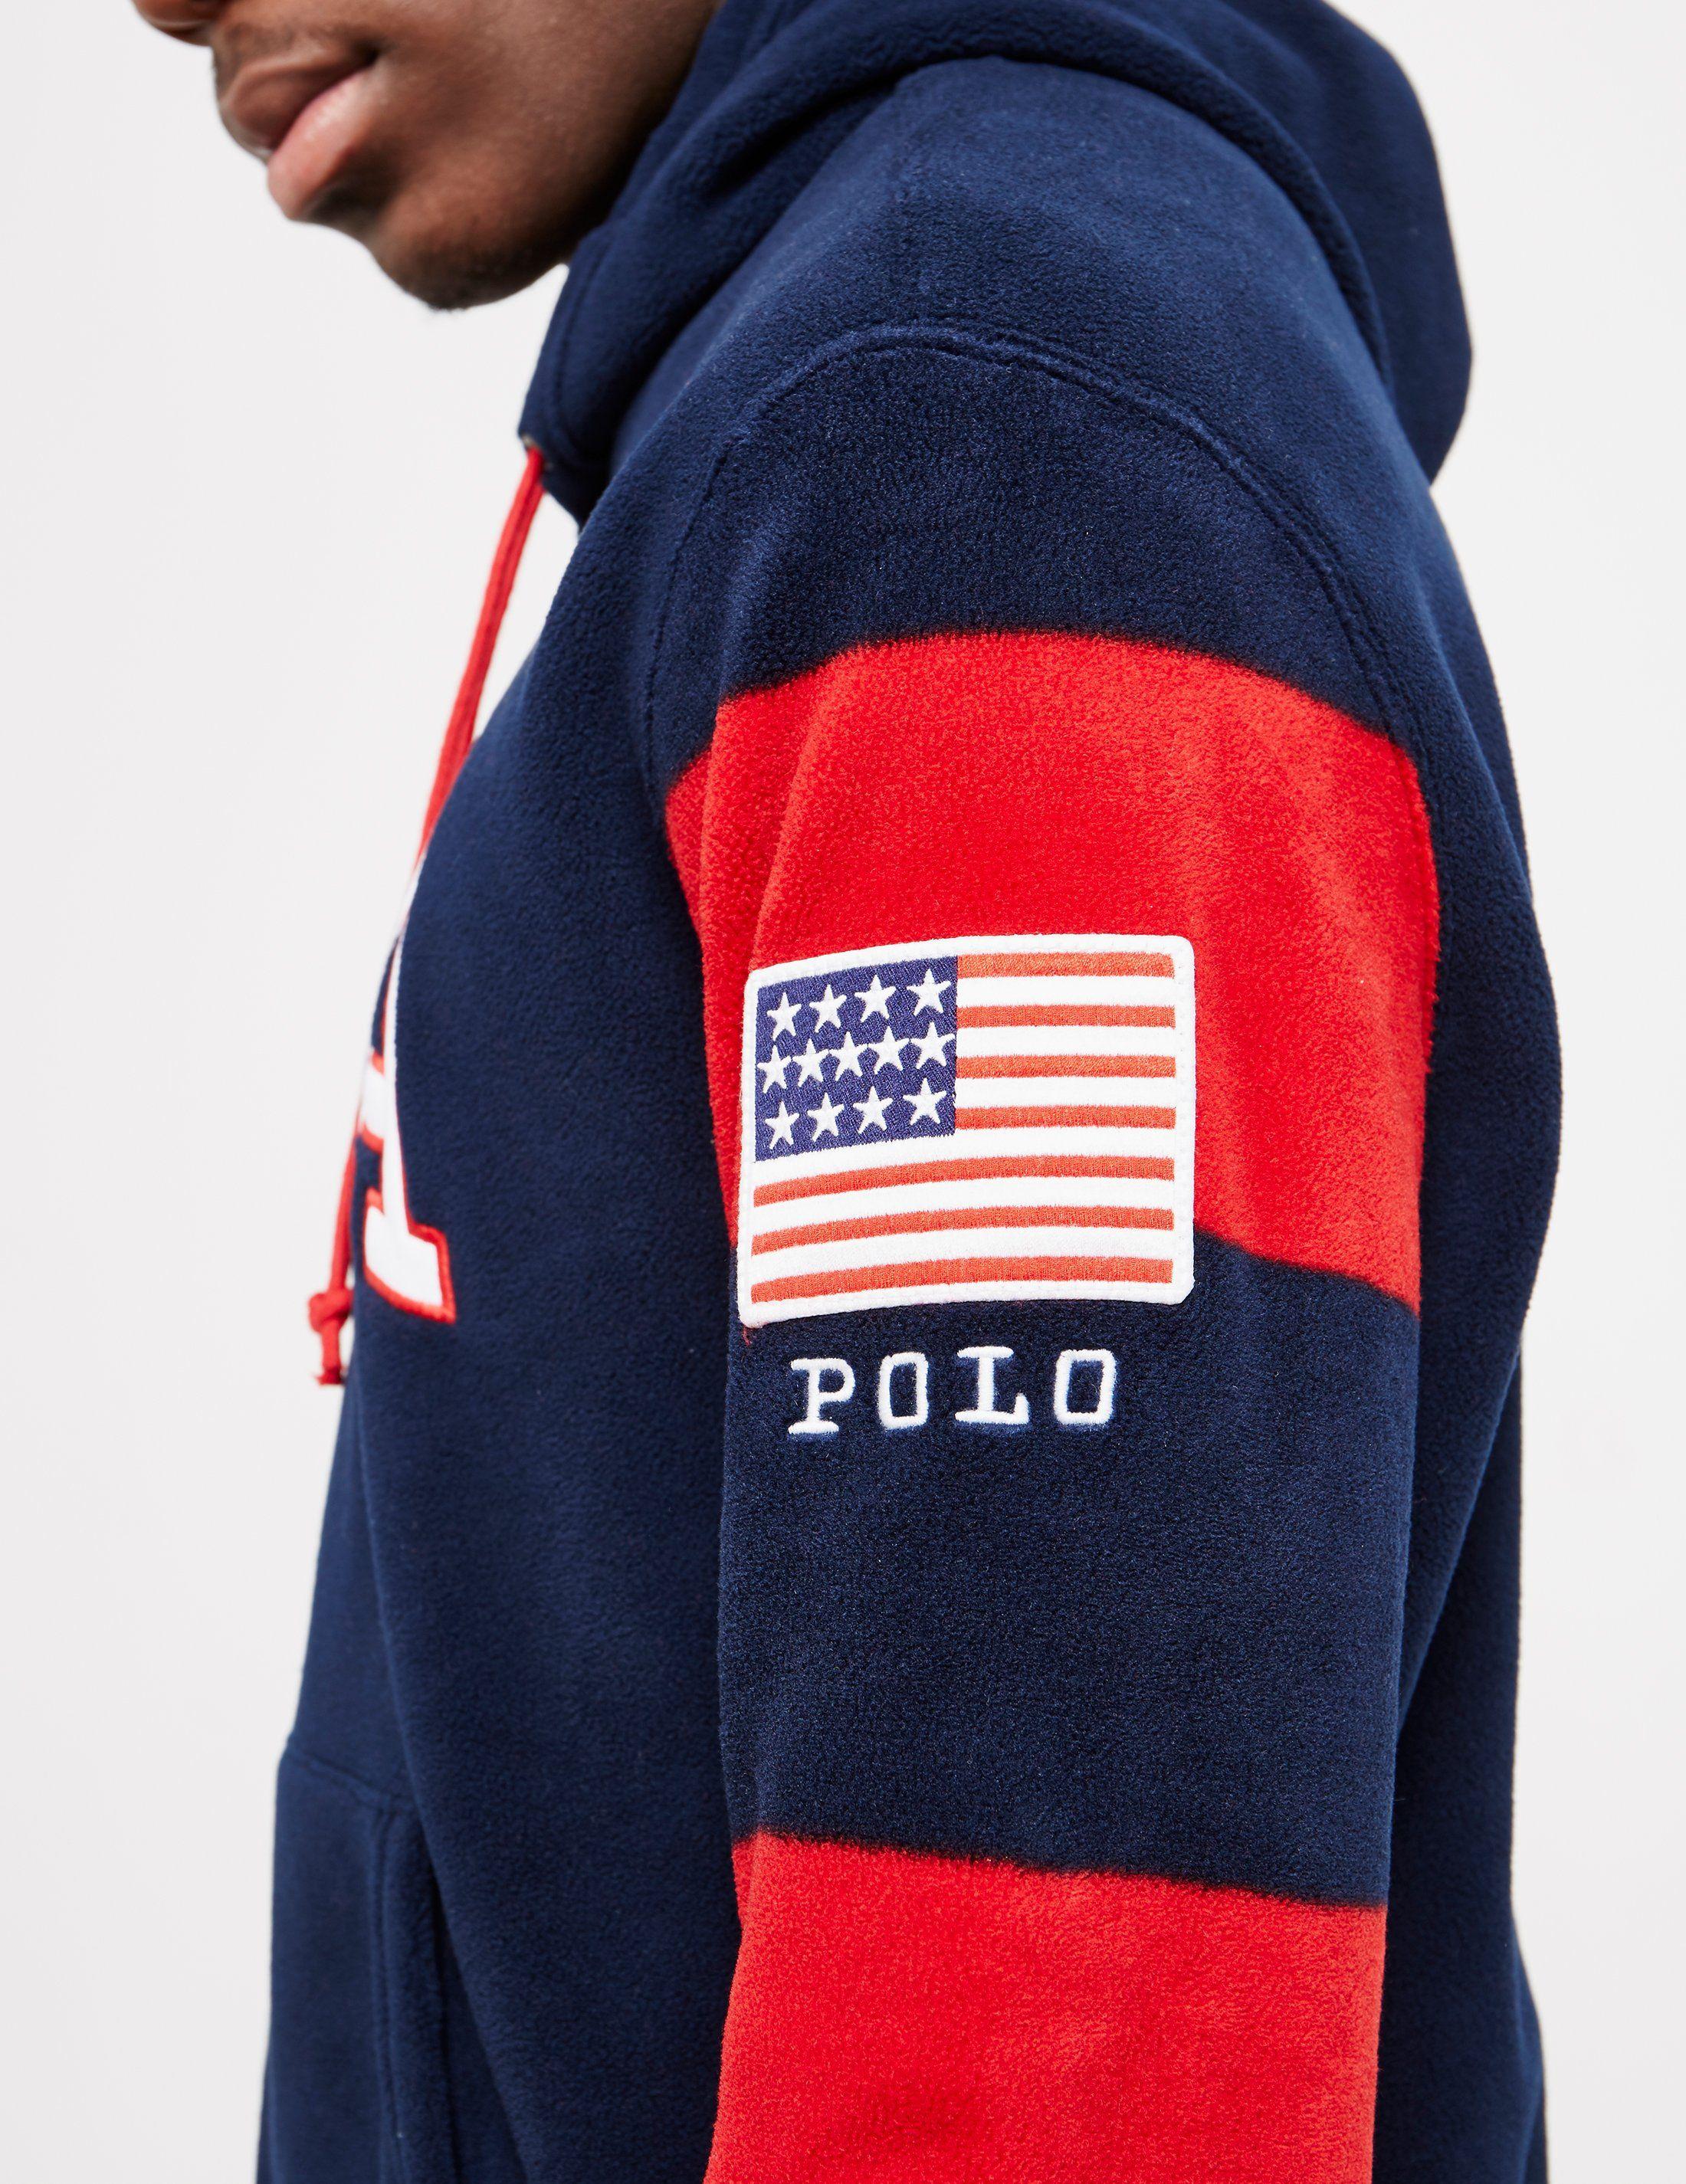 Polo Ralph Lauren USA Overhead Polar Hoodie - Online Exclusive